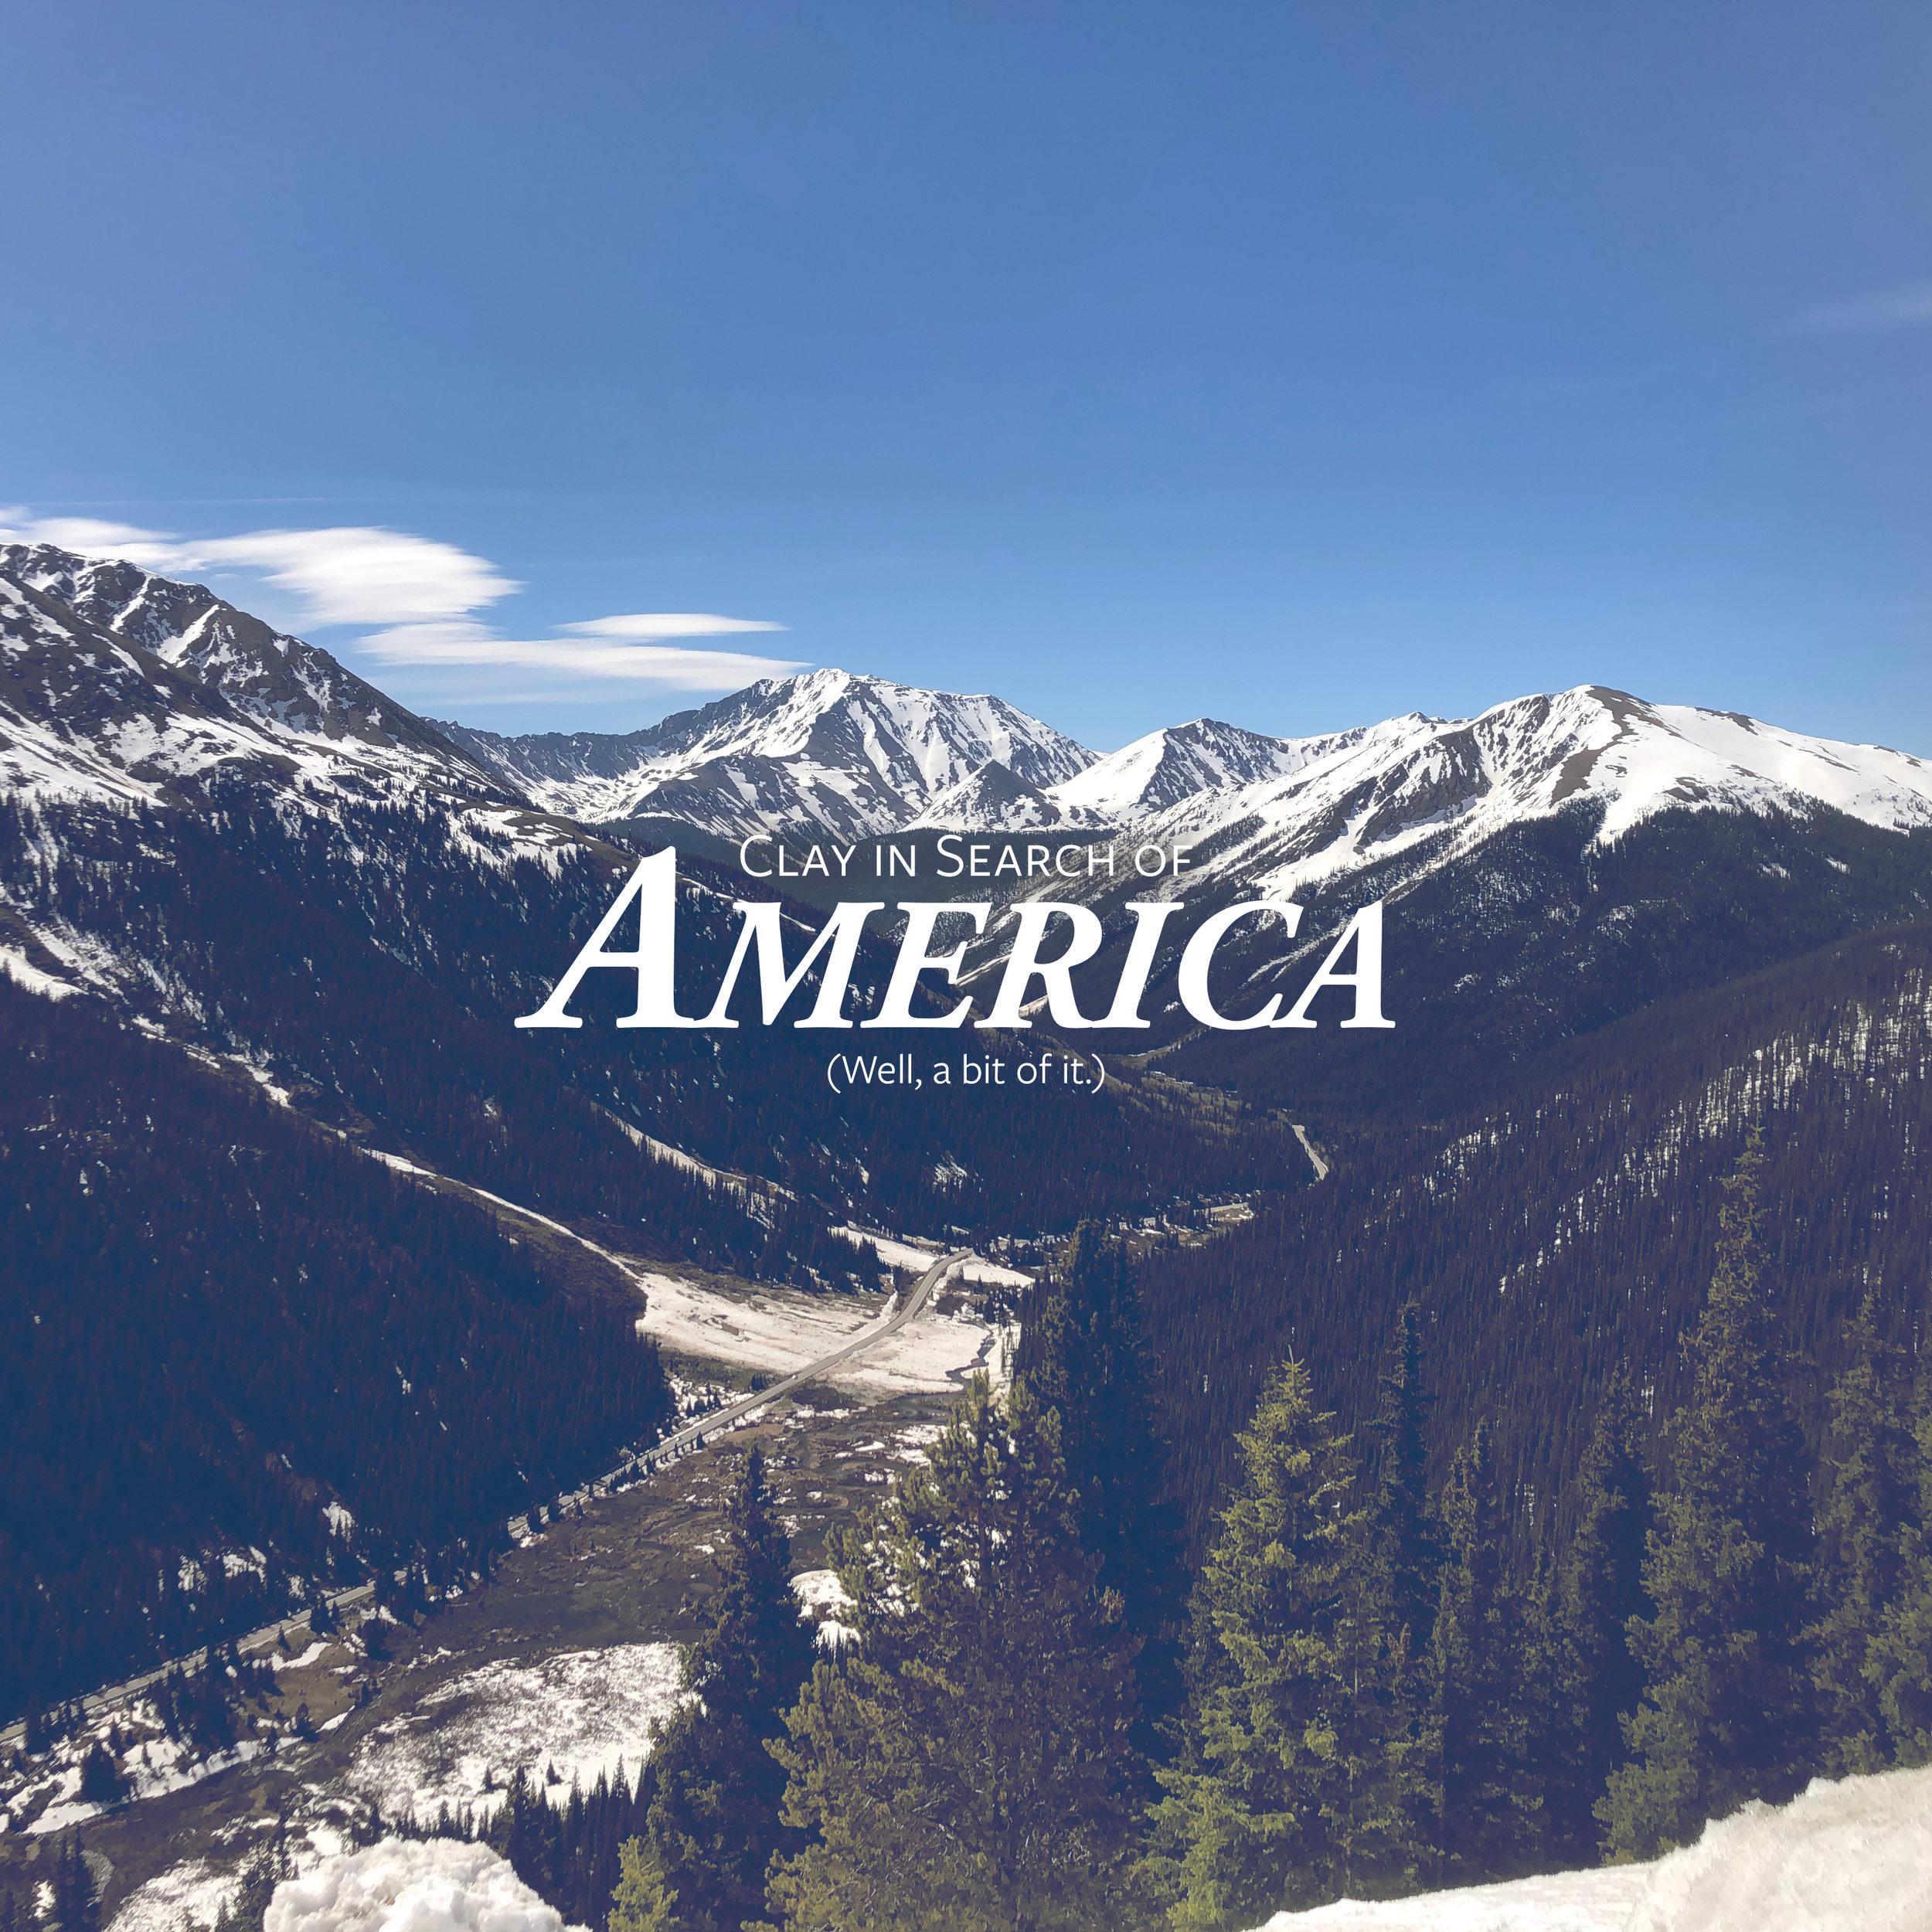 America 7.jpg